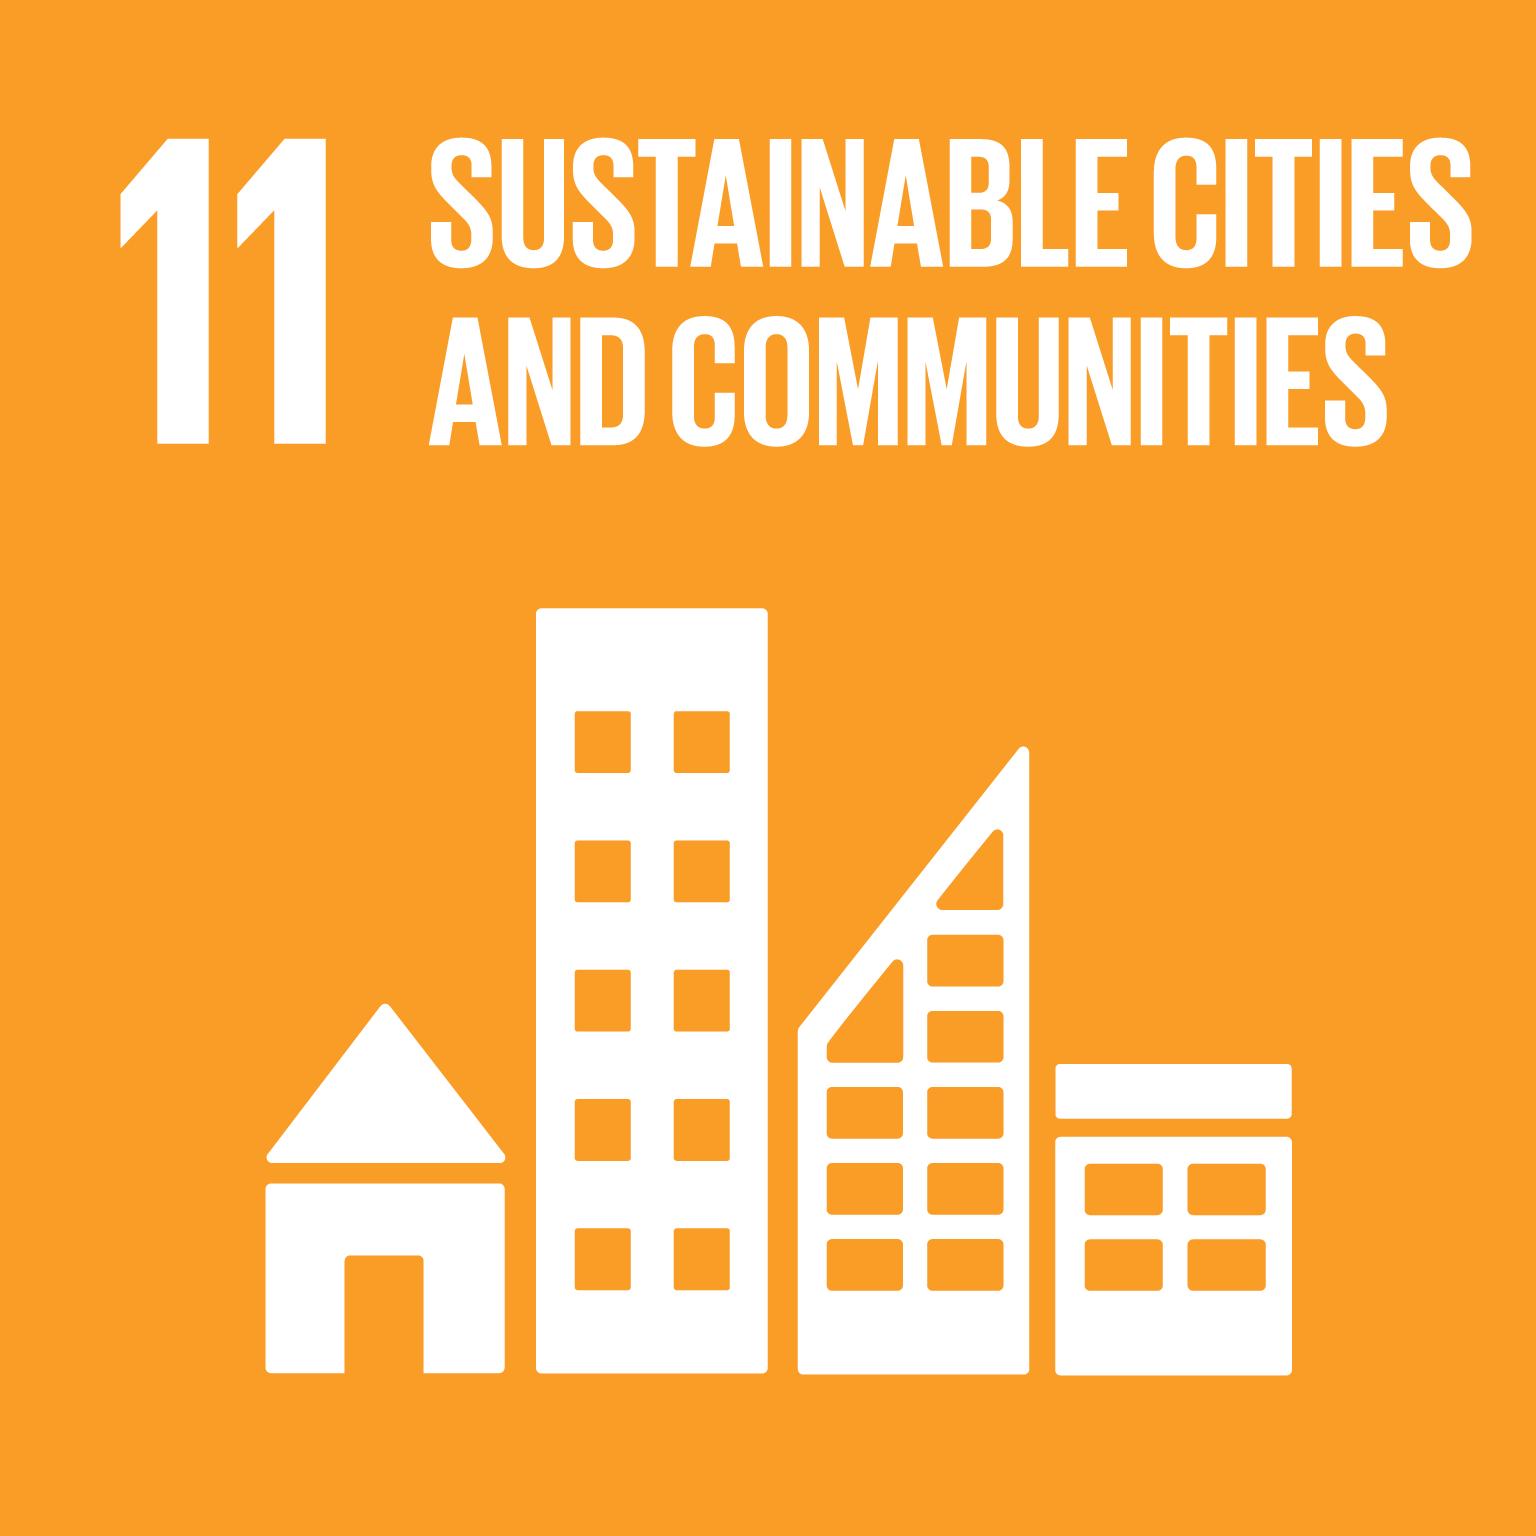 Sustainable Development Goals 11 sustainable cities communities